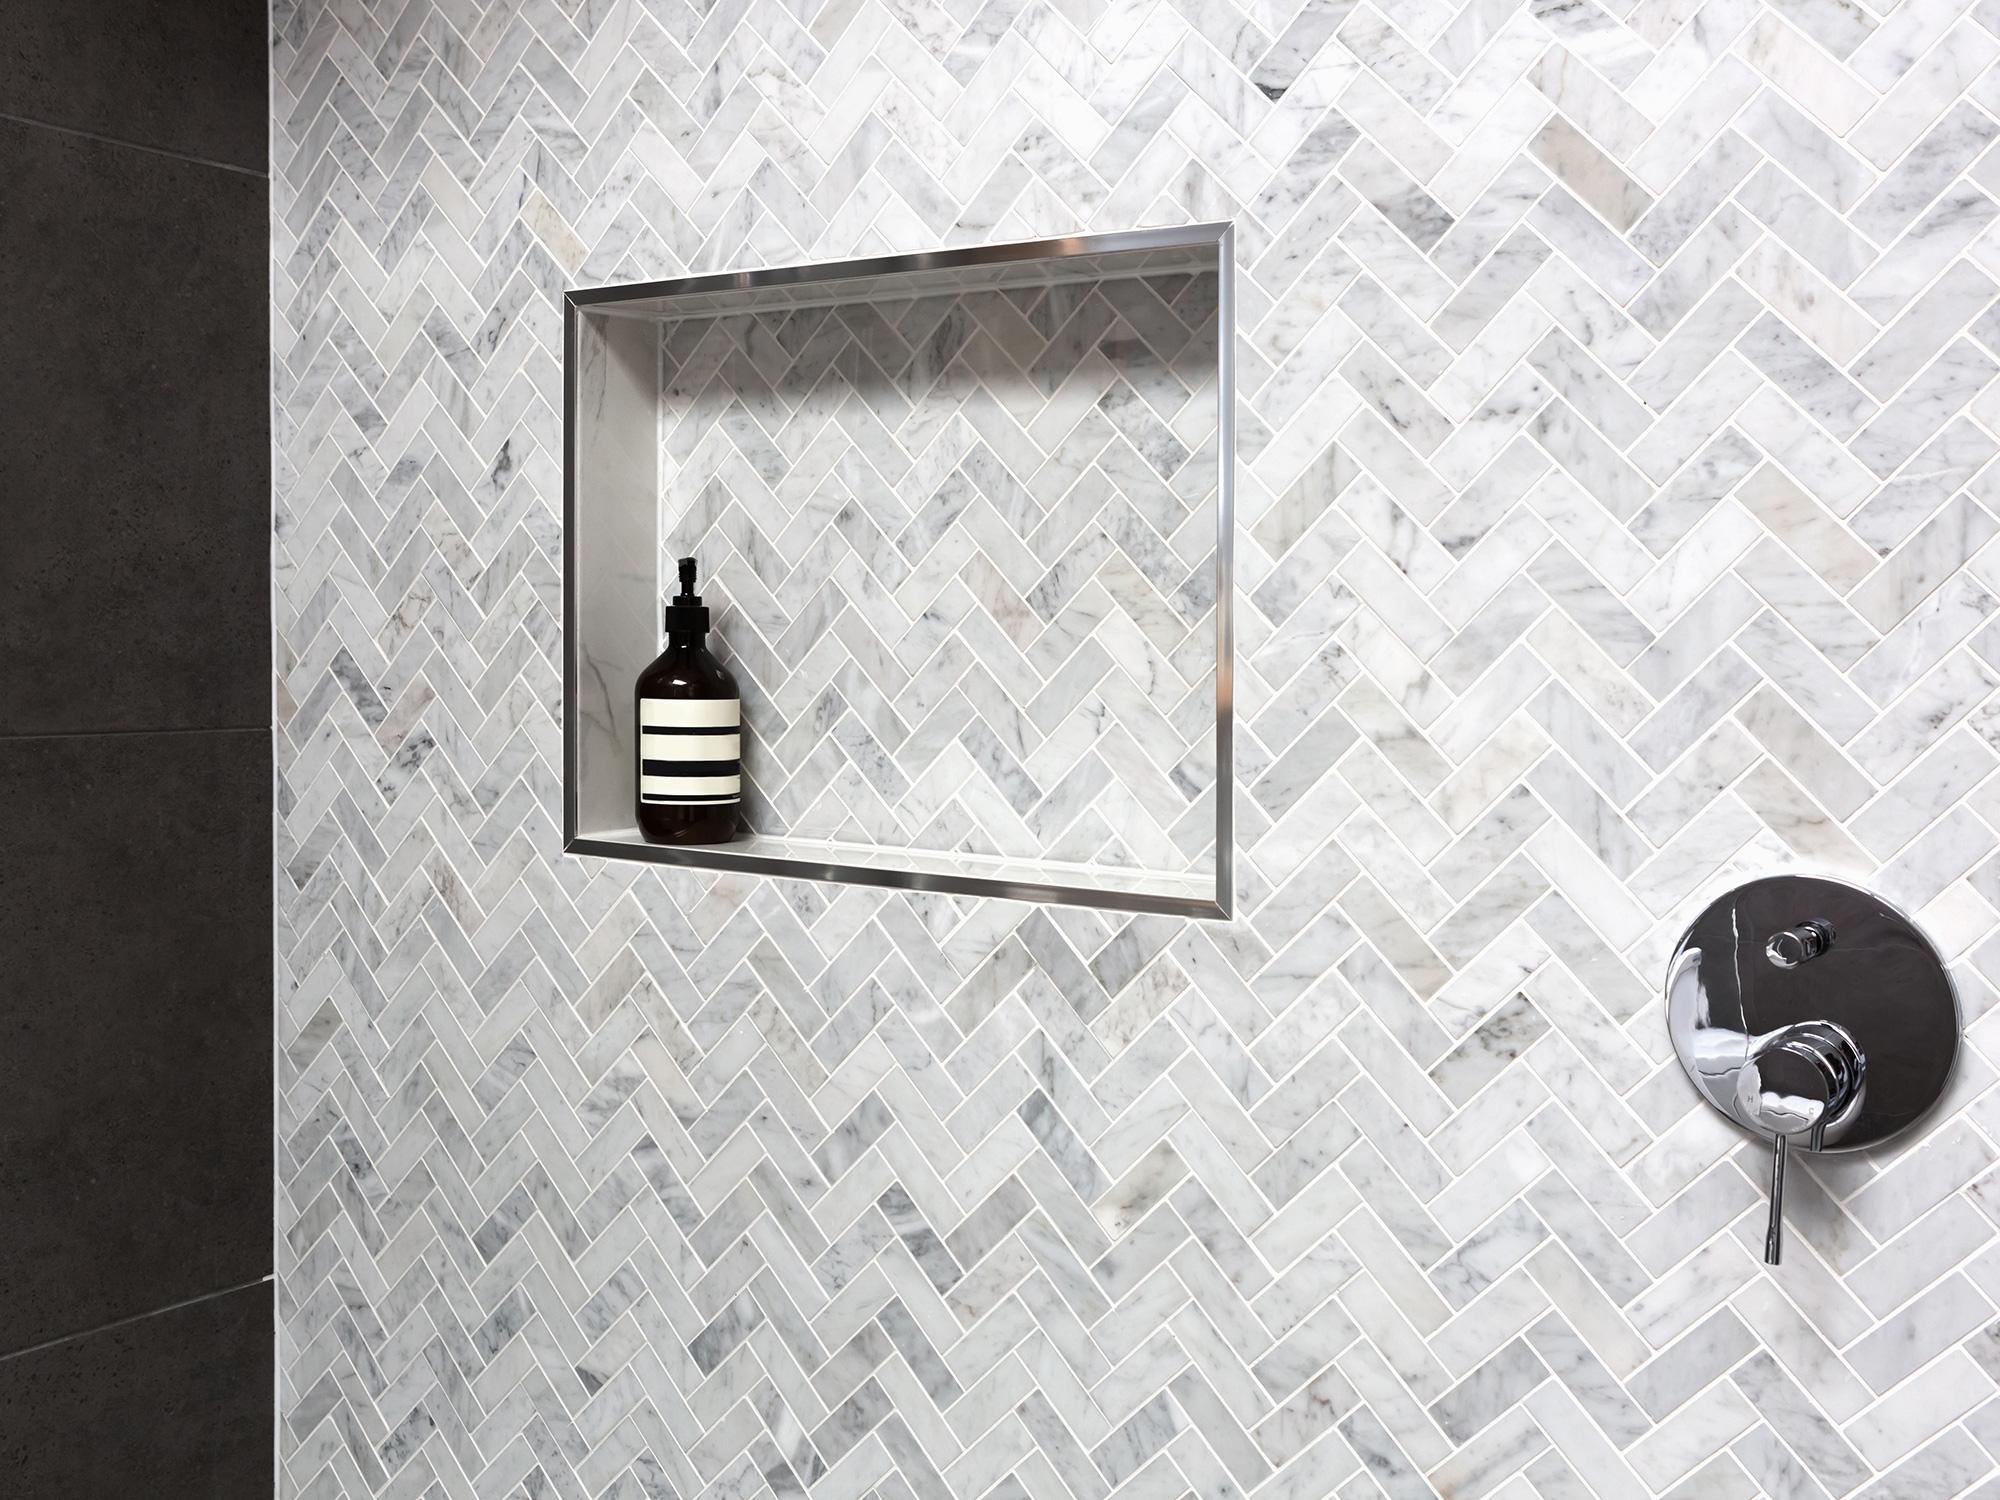 how to clean bathroom tile grout until it sparkles realestate com au